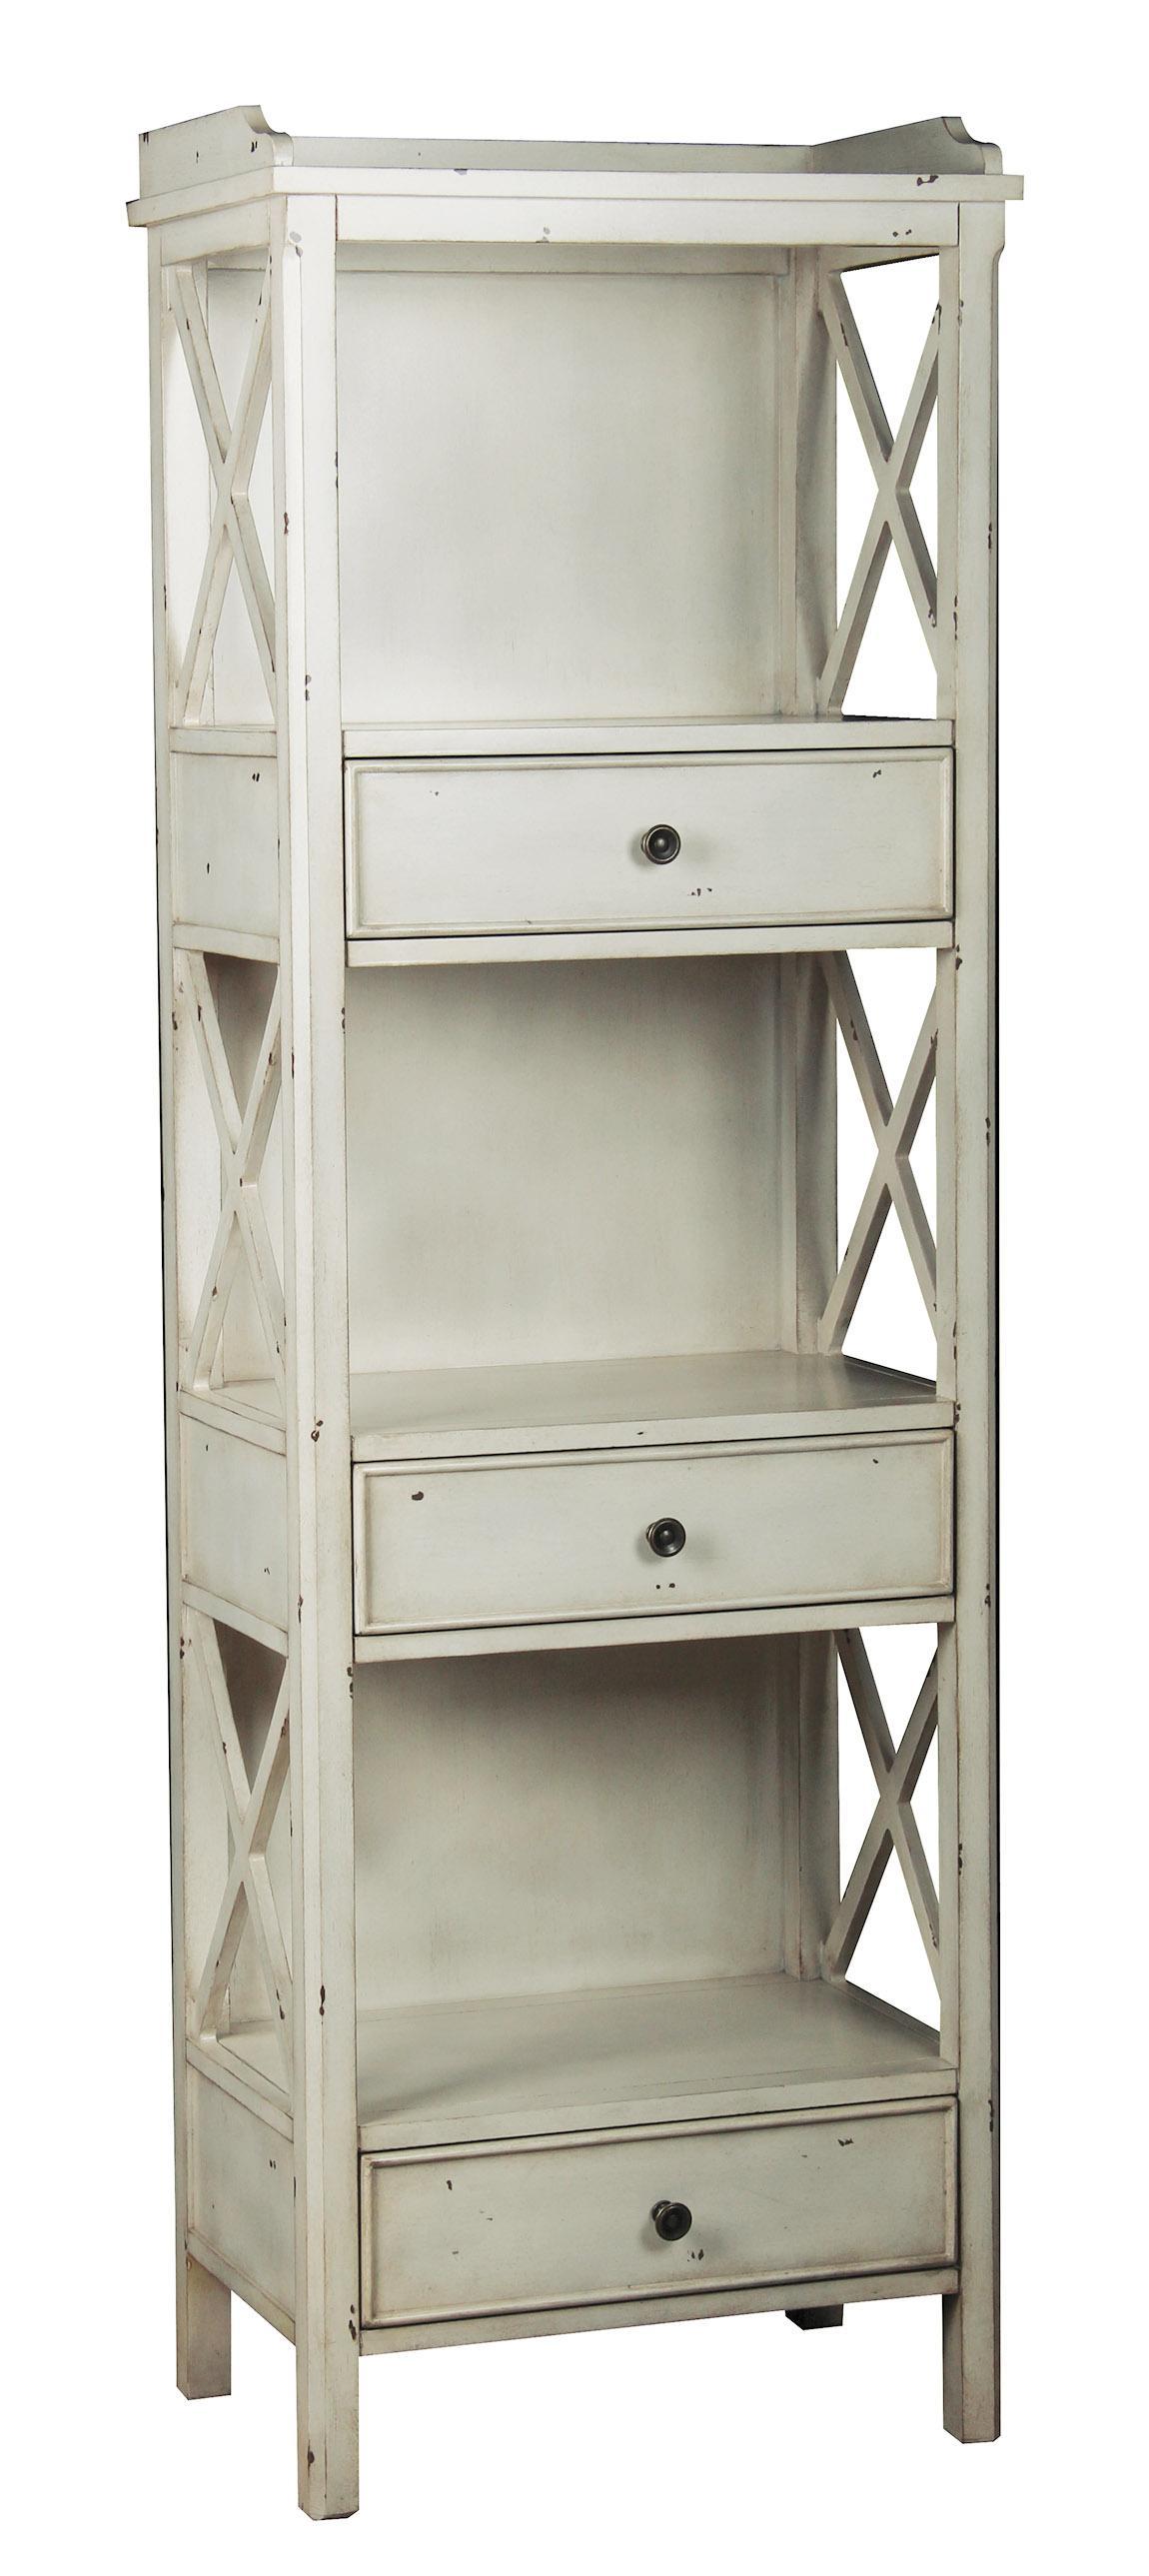 Pulaski Furniture Accents Bookcase - Item Number: 549115